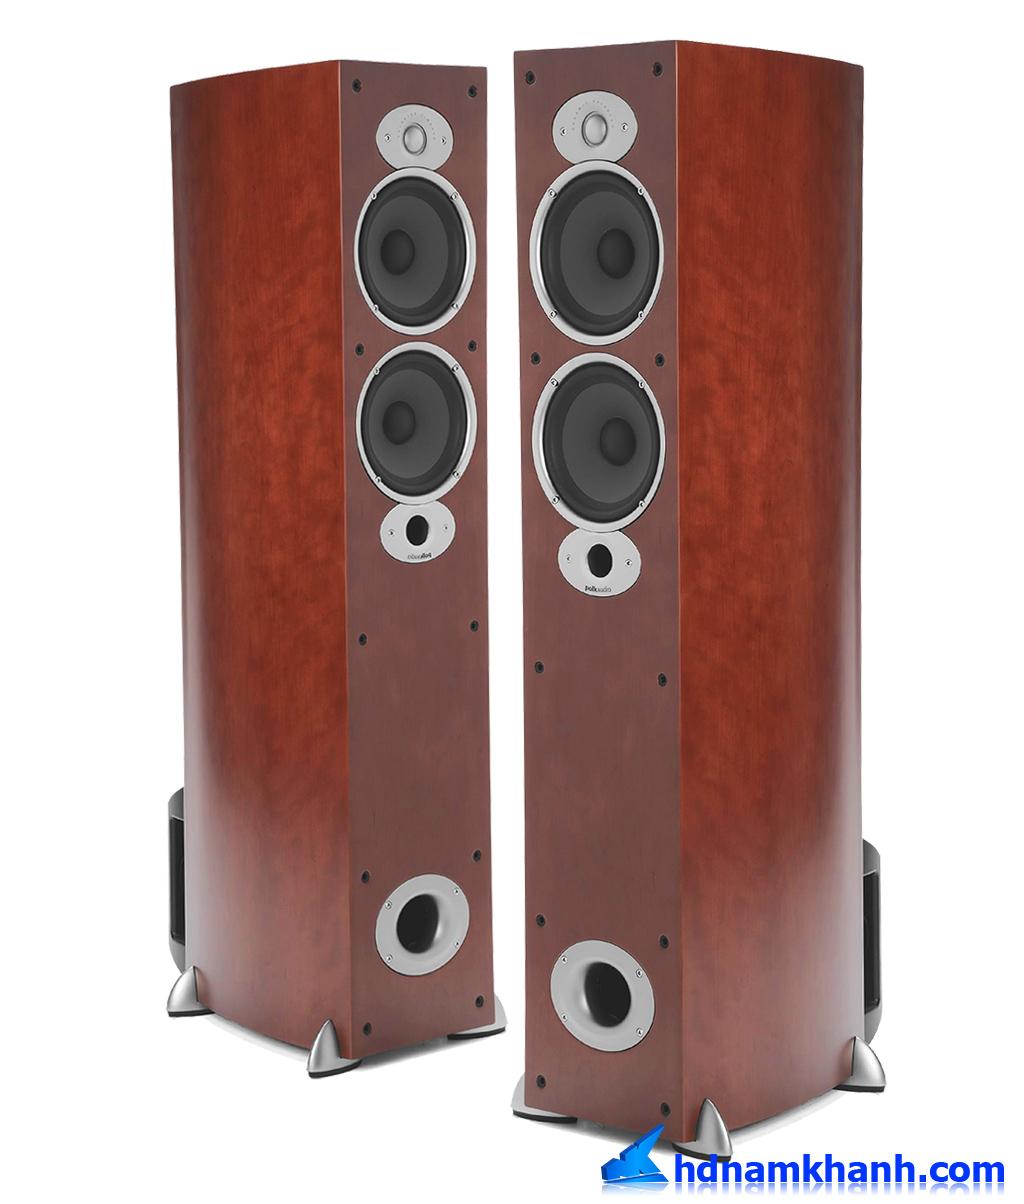 Loa Polk audio RTI A5, loa nghe nhạc tiếng rất mềm mại